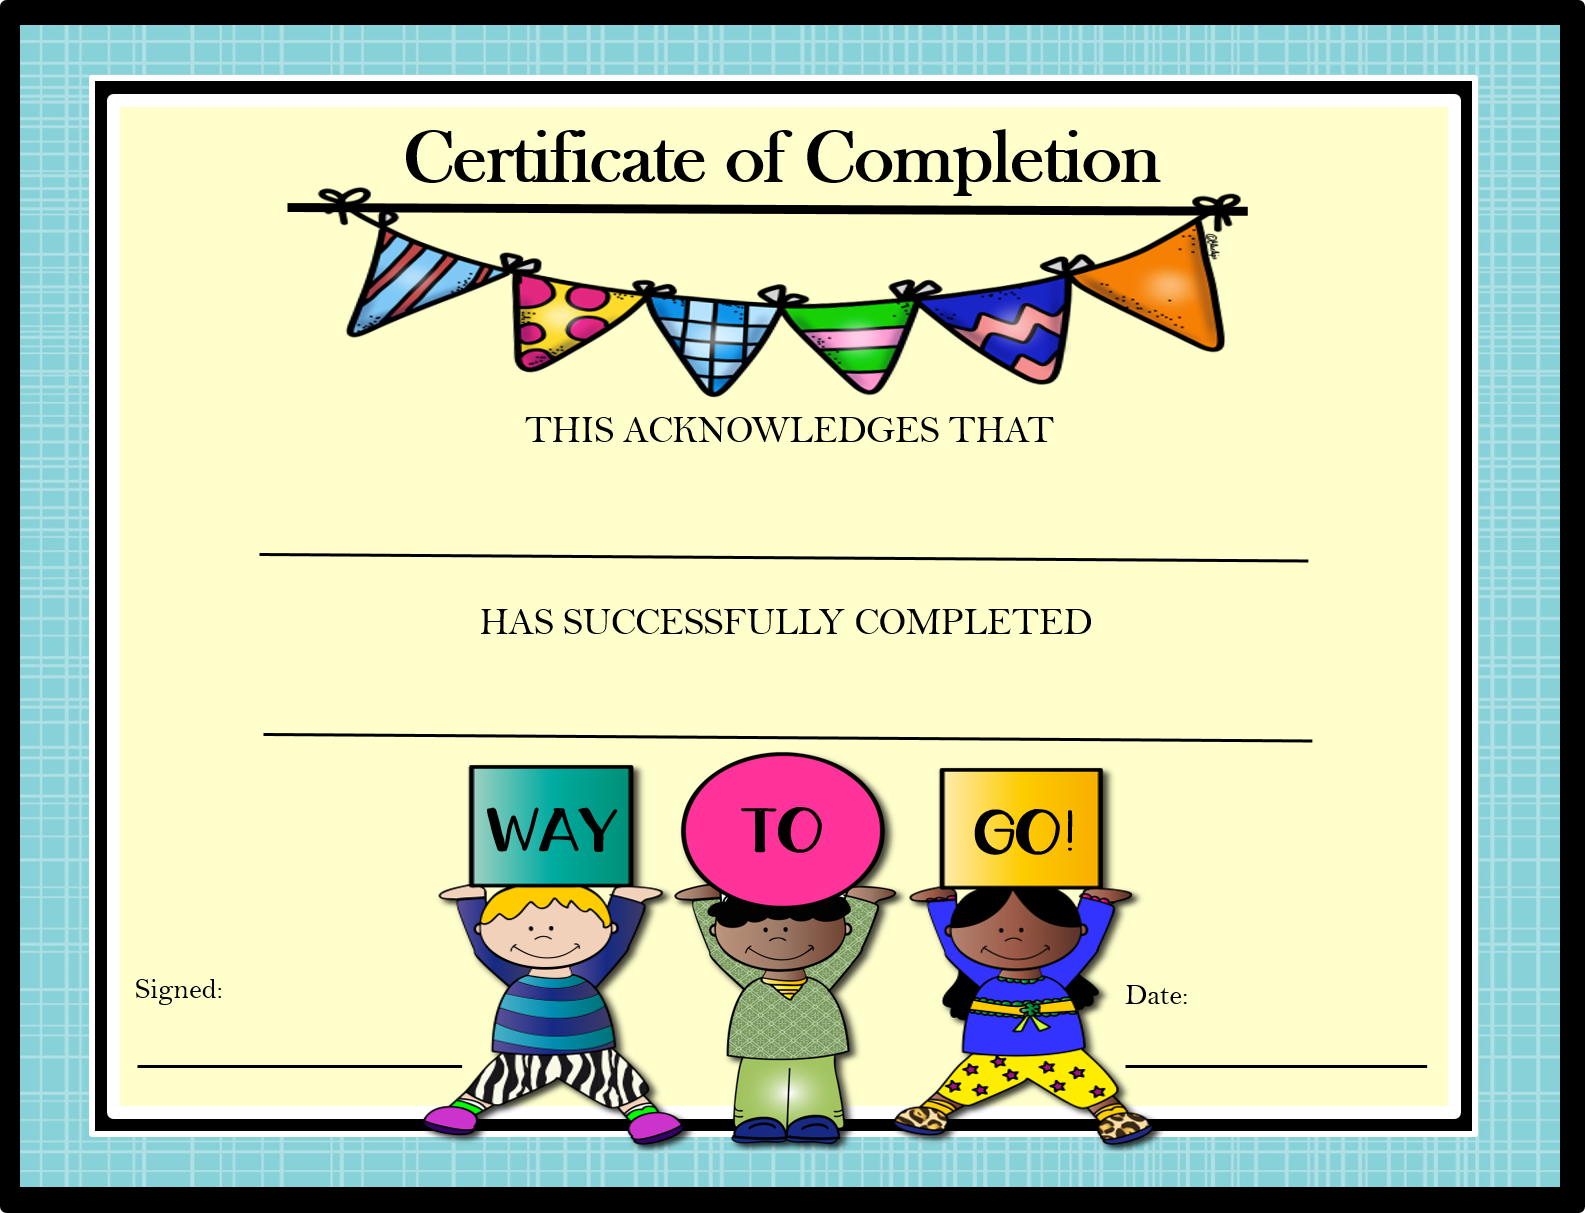 100 kindergarten graduation certificate template templates kindergarten graduation certificate template certificates of completion promotion or achievement for any yadclub Gallery